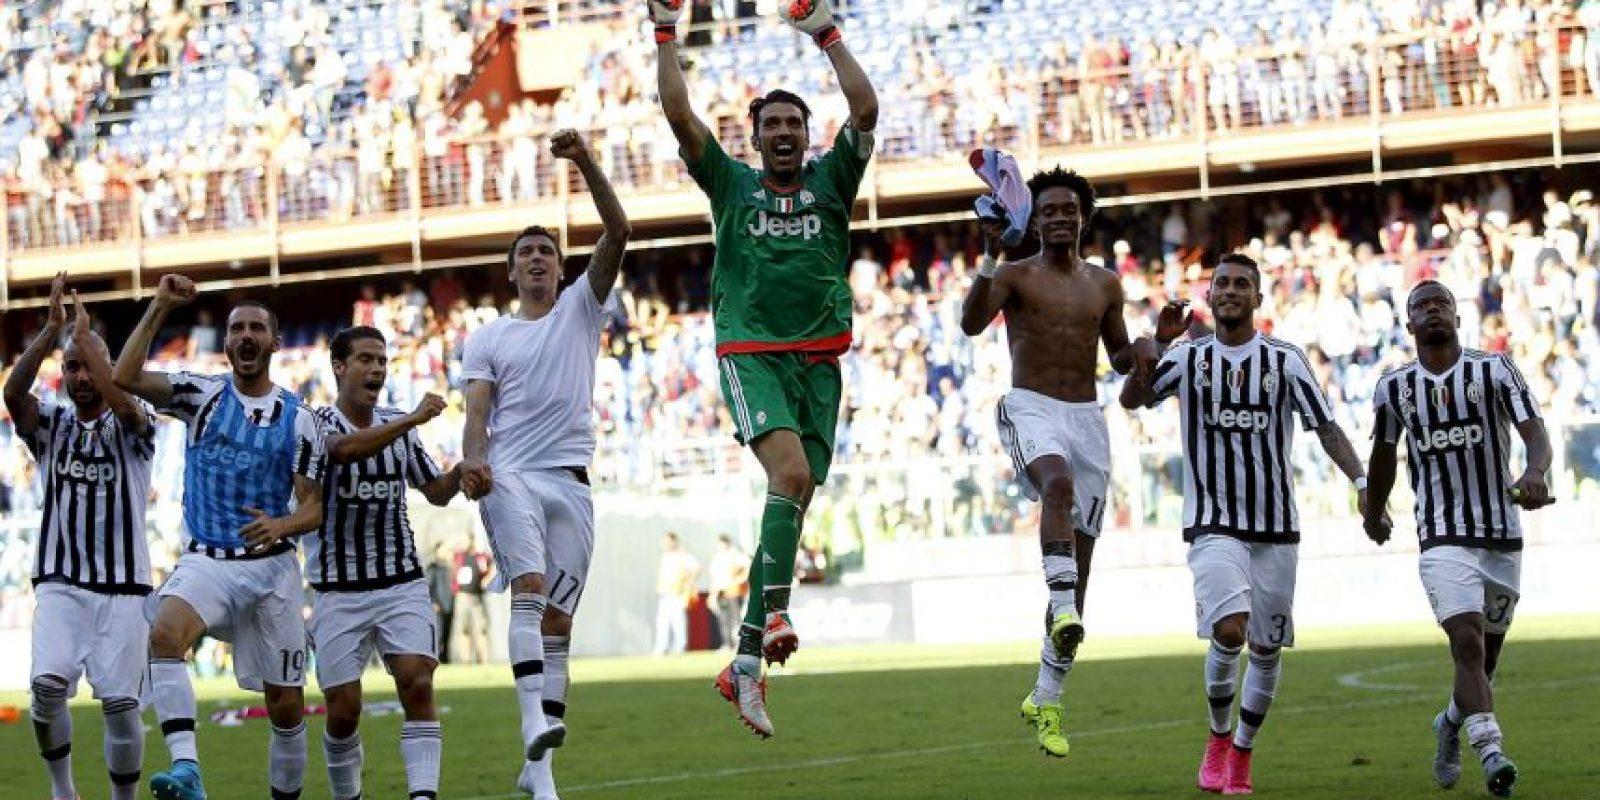 Juventus recibe al Sevilla en Juventus Stadium, en duelo del grupo D. Foto:Getty Images